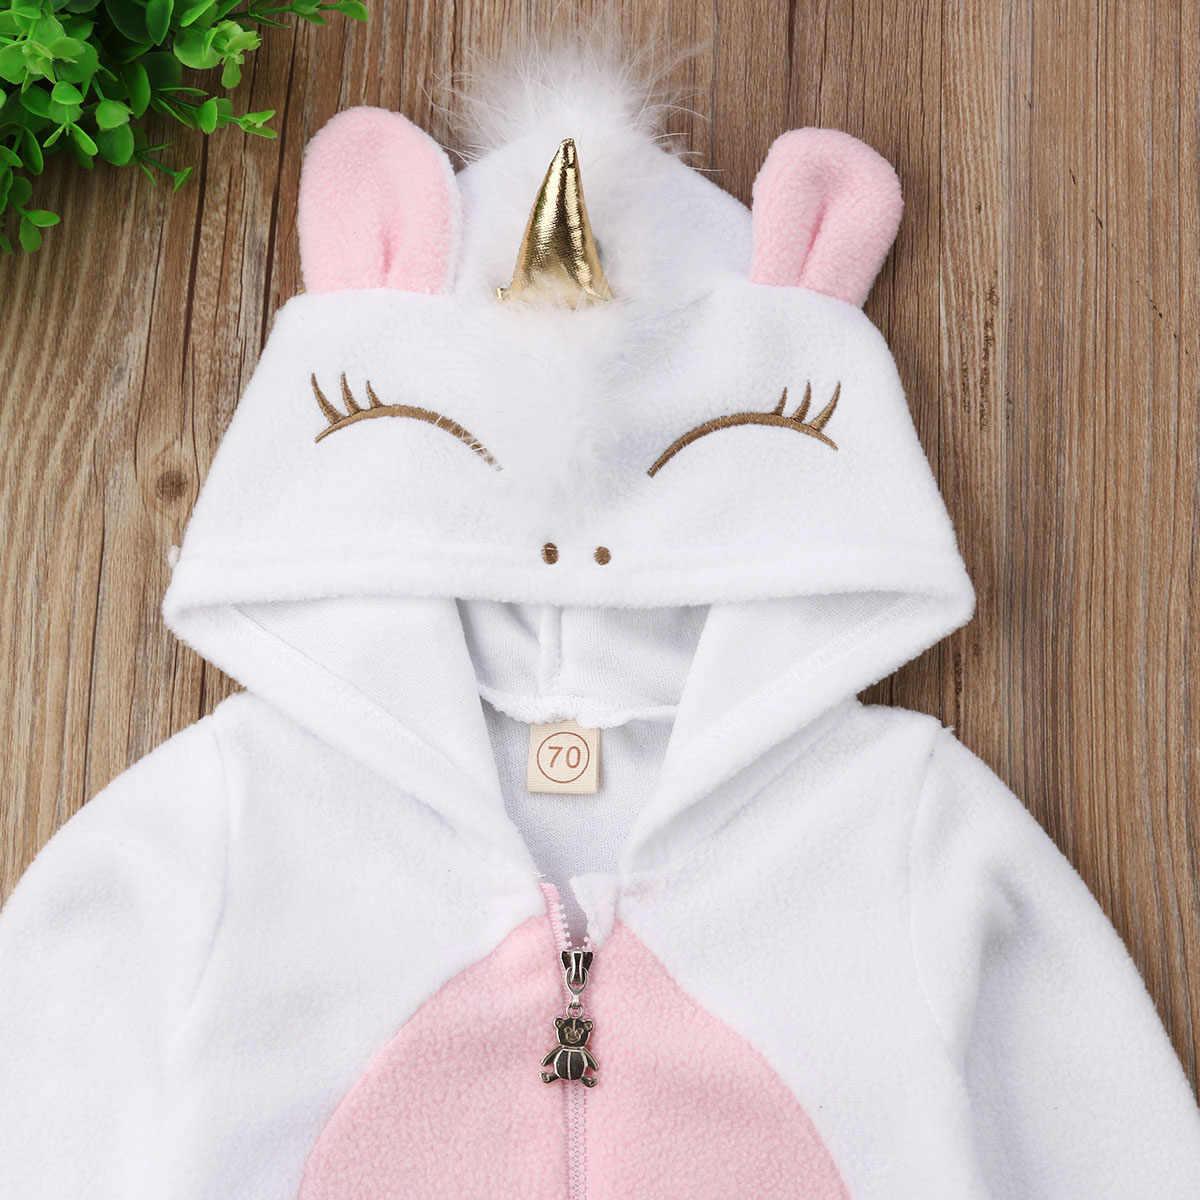 63fdbdf7f8f ... 2019 Fashion Newborn Toddler Baby Girls 3D Unicorn Hooded Zipper Romper  Jumpsuit Outfits Clothes Autumn Winter ...